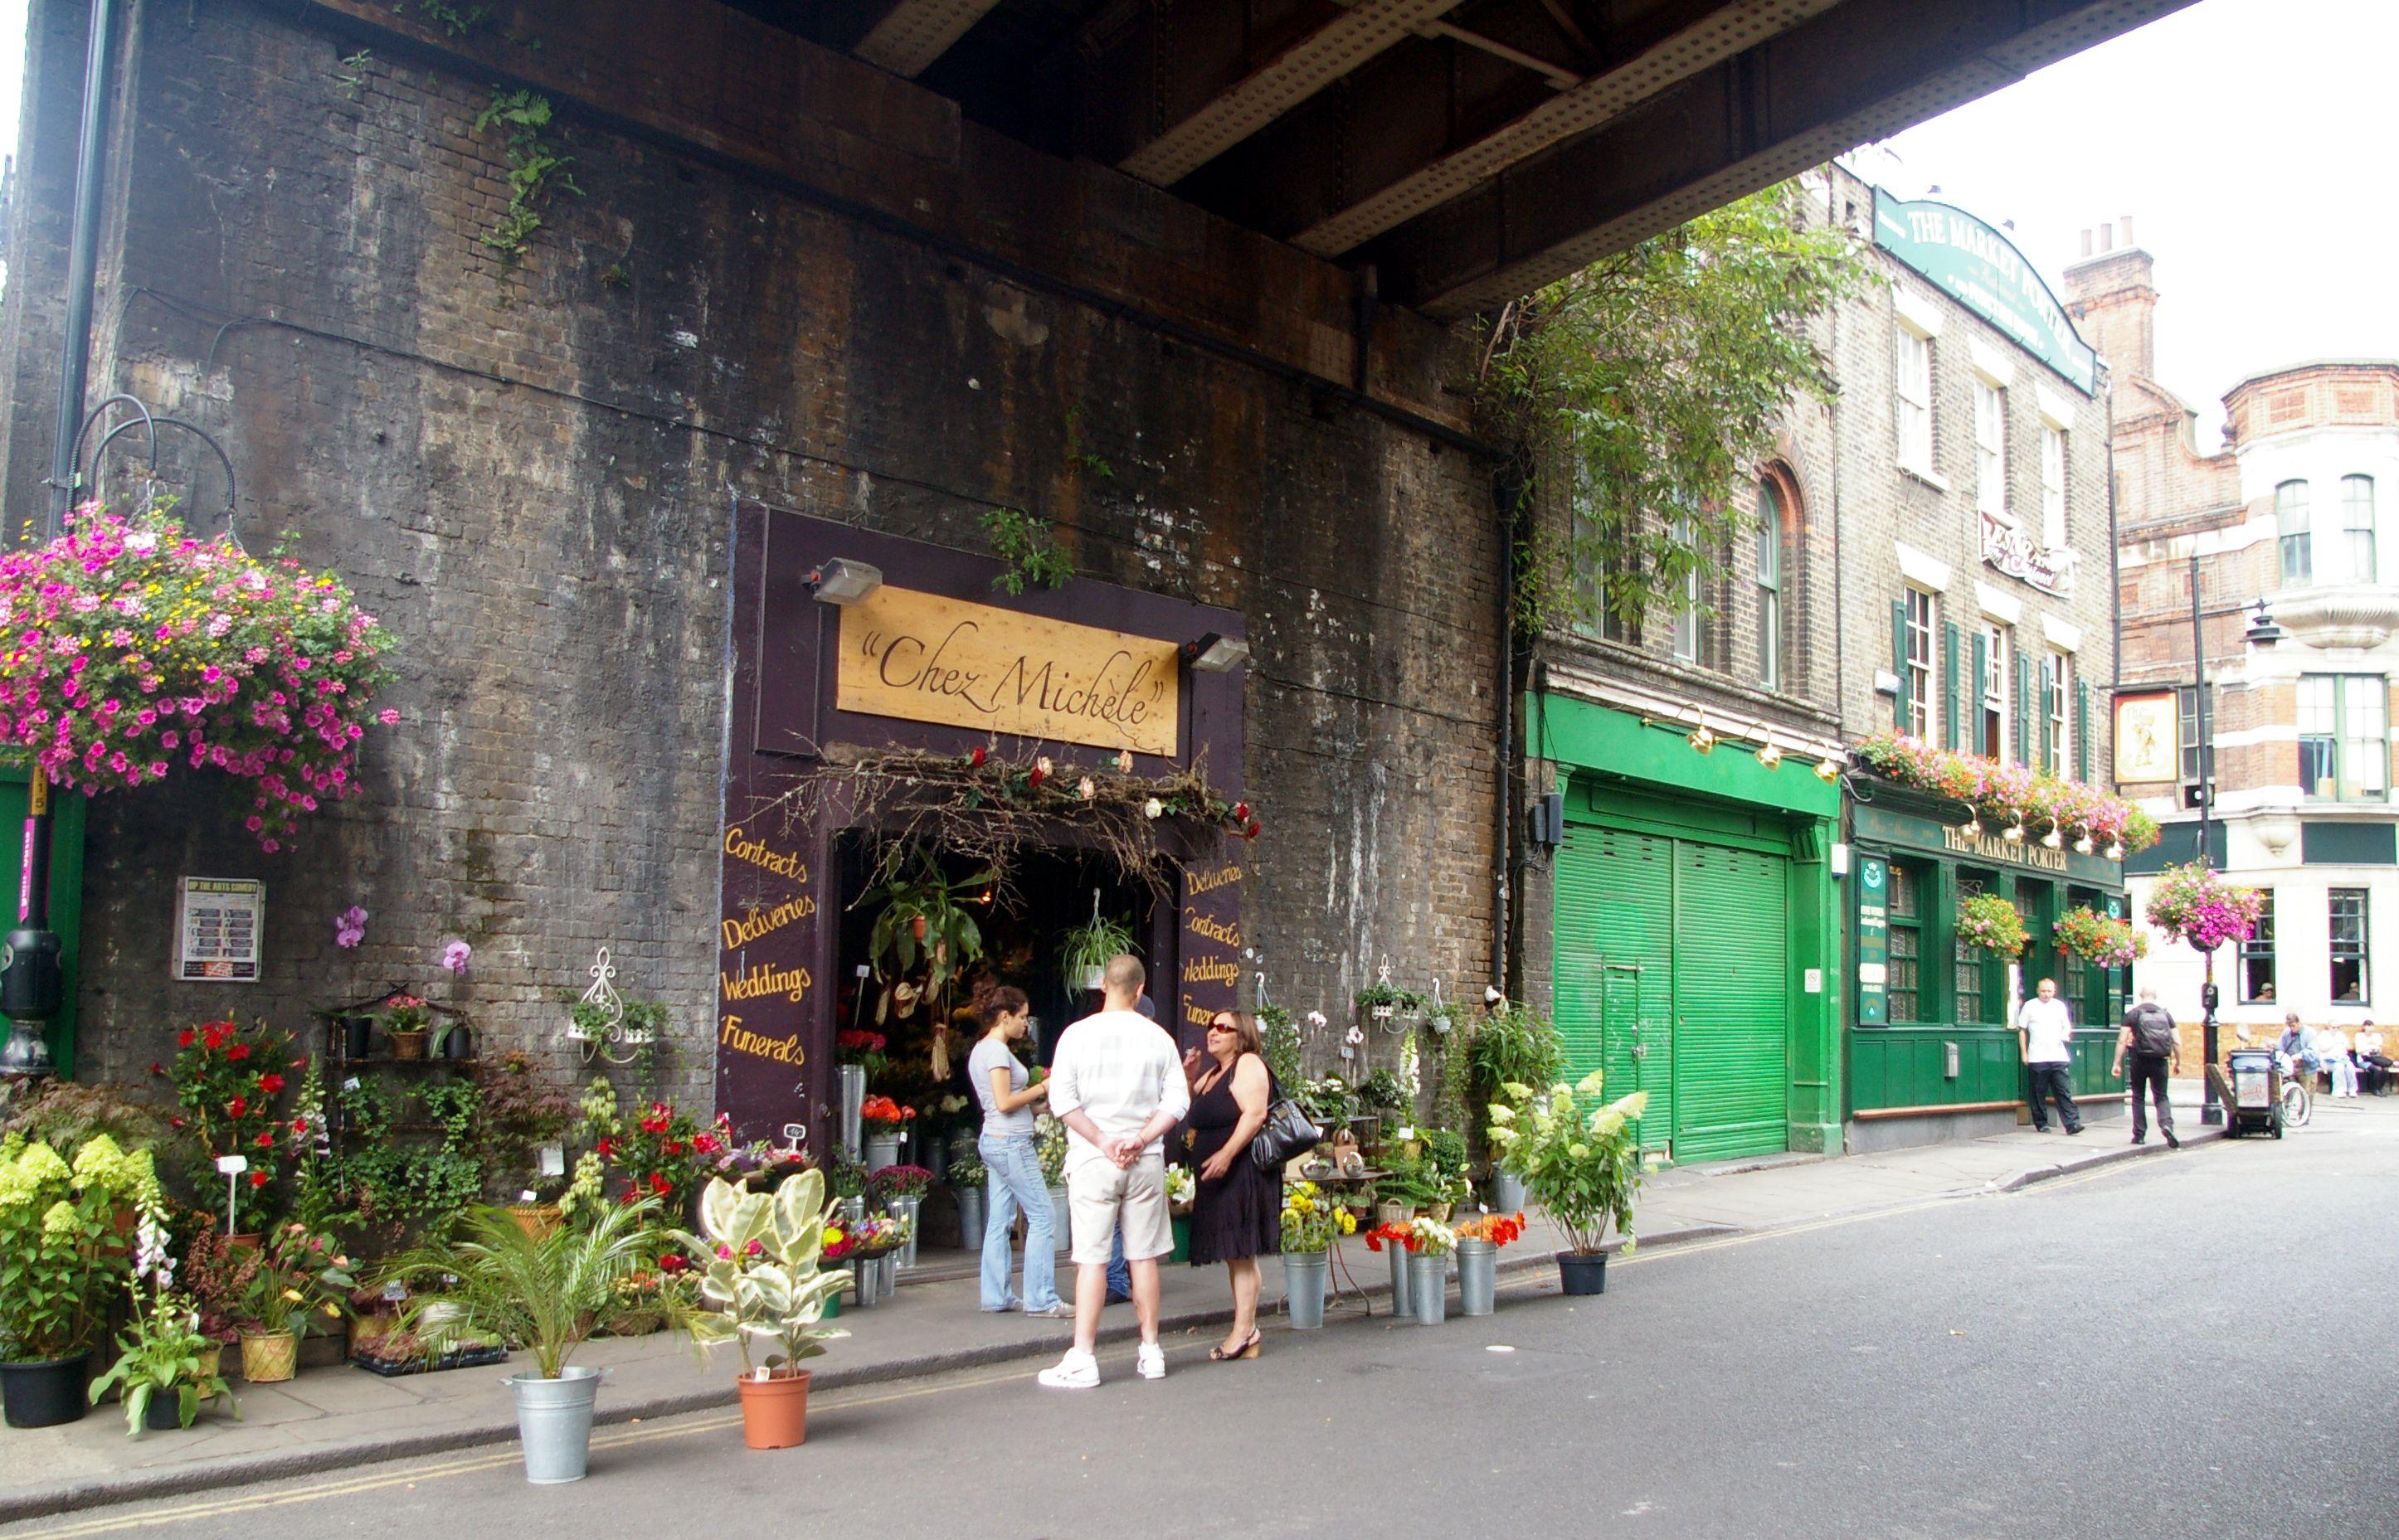 Leaky Cauldron, Stoney Street, Borough Market, London